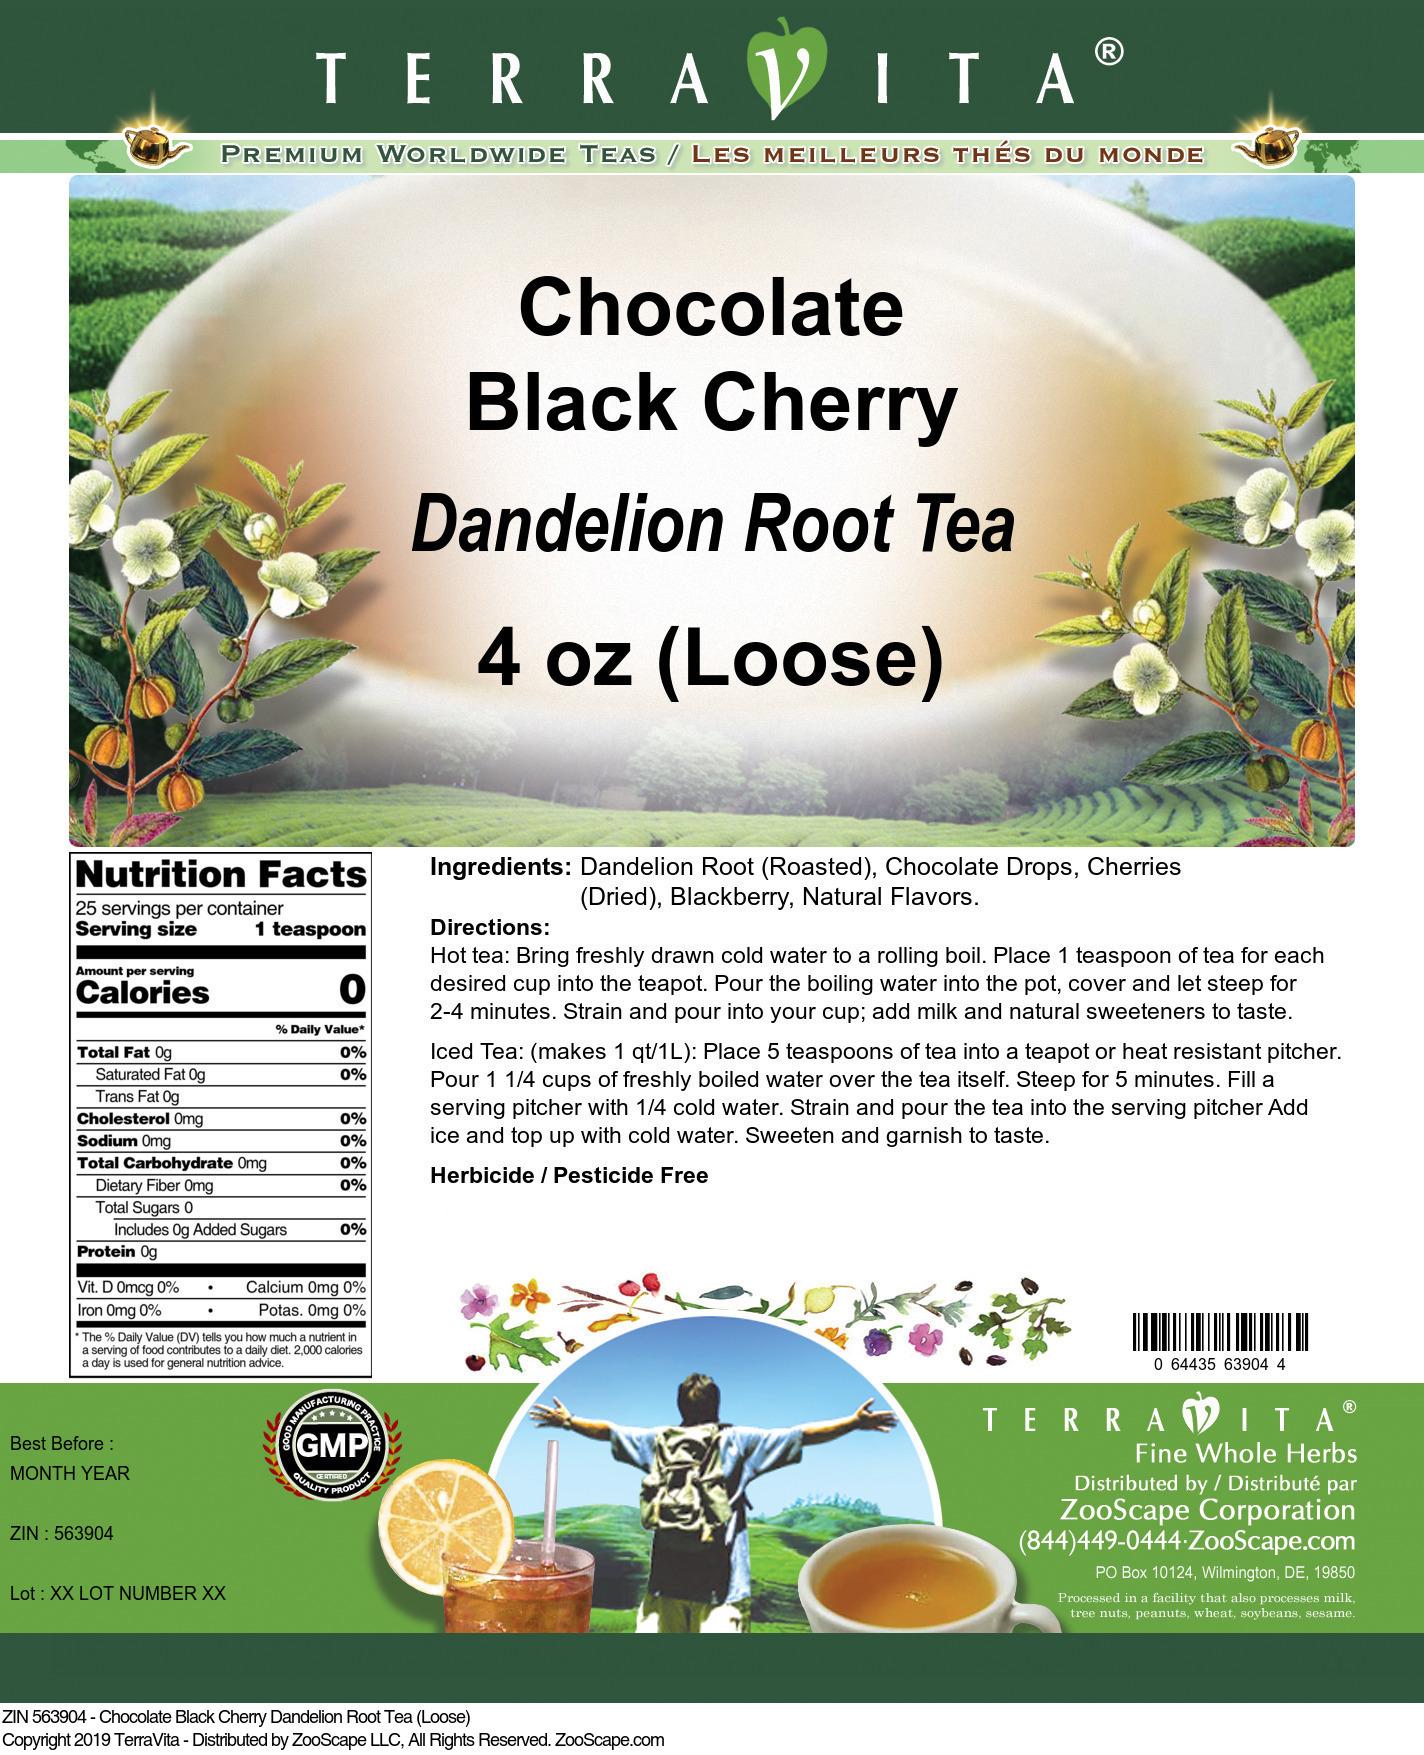 Chocolate Black Cherry Dandelion Root Tea (Loose)